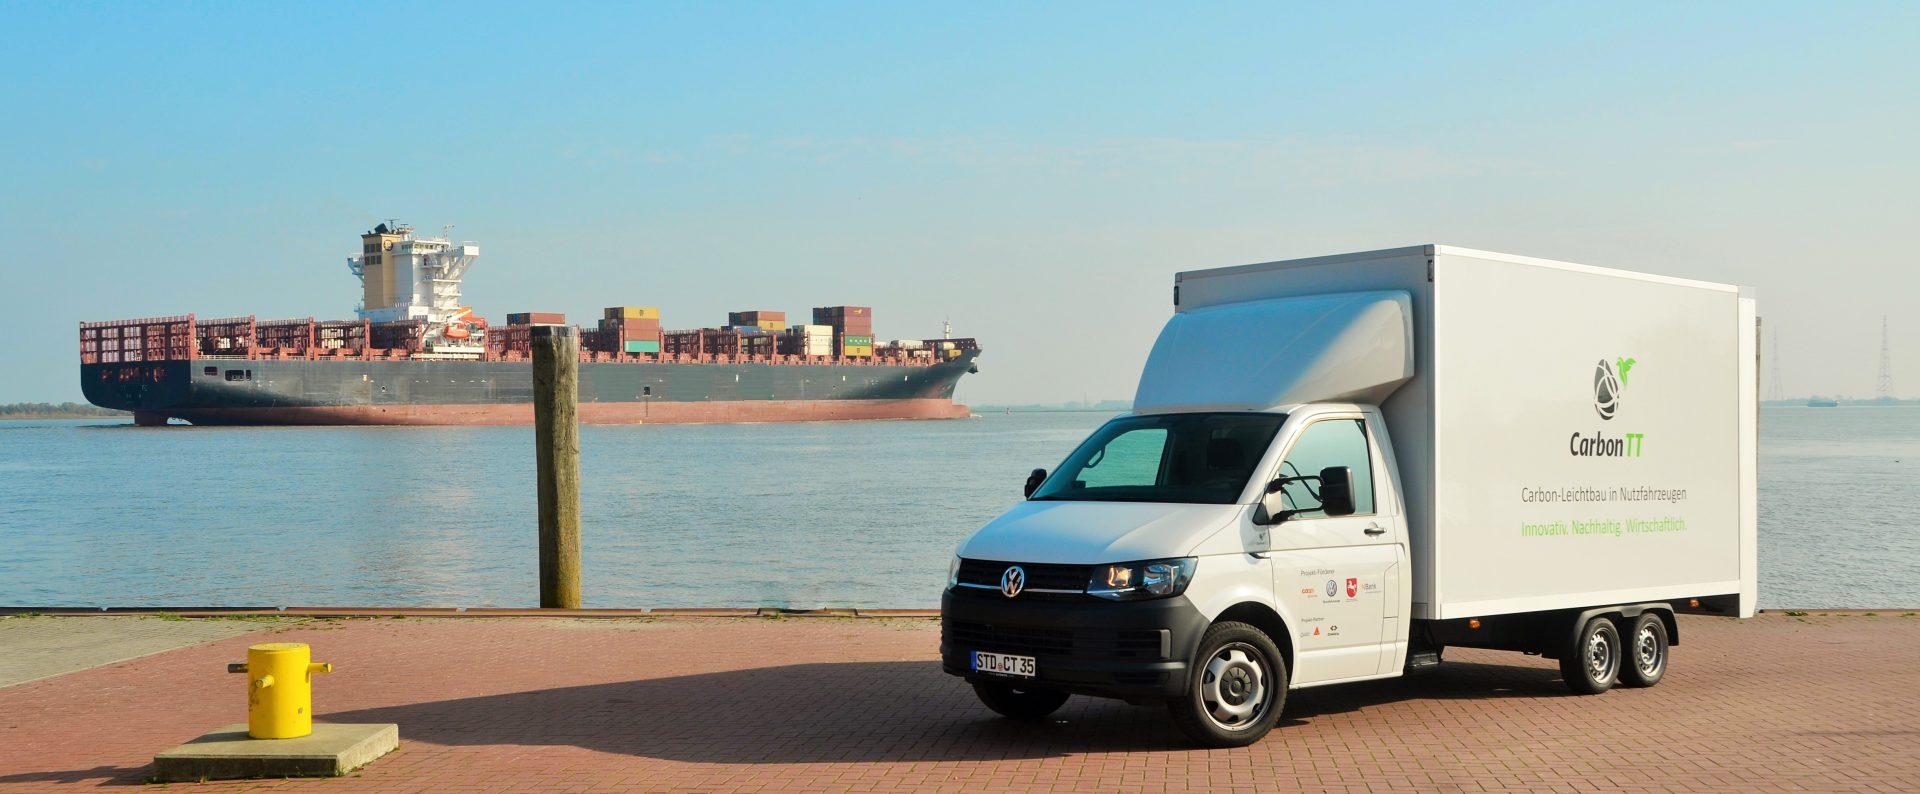 Carbon Truck & Trailer GmbH